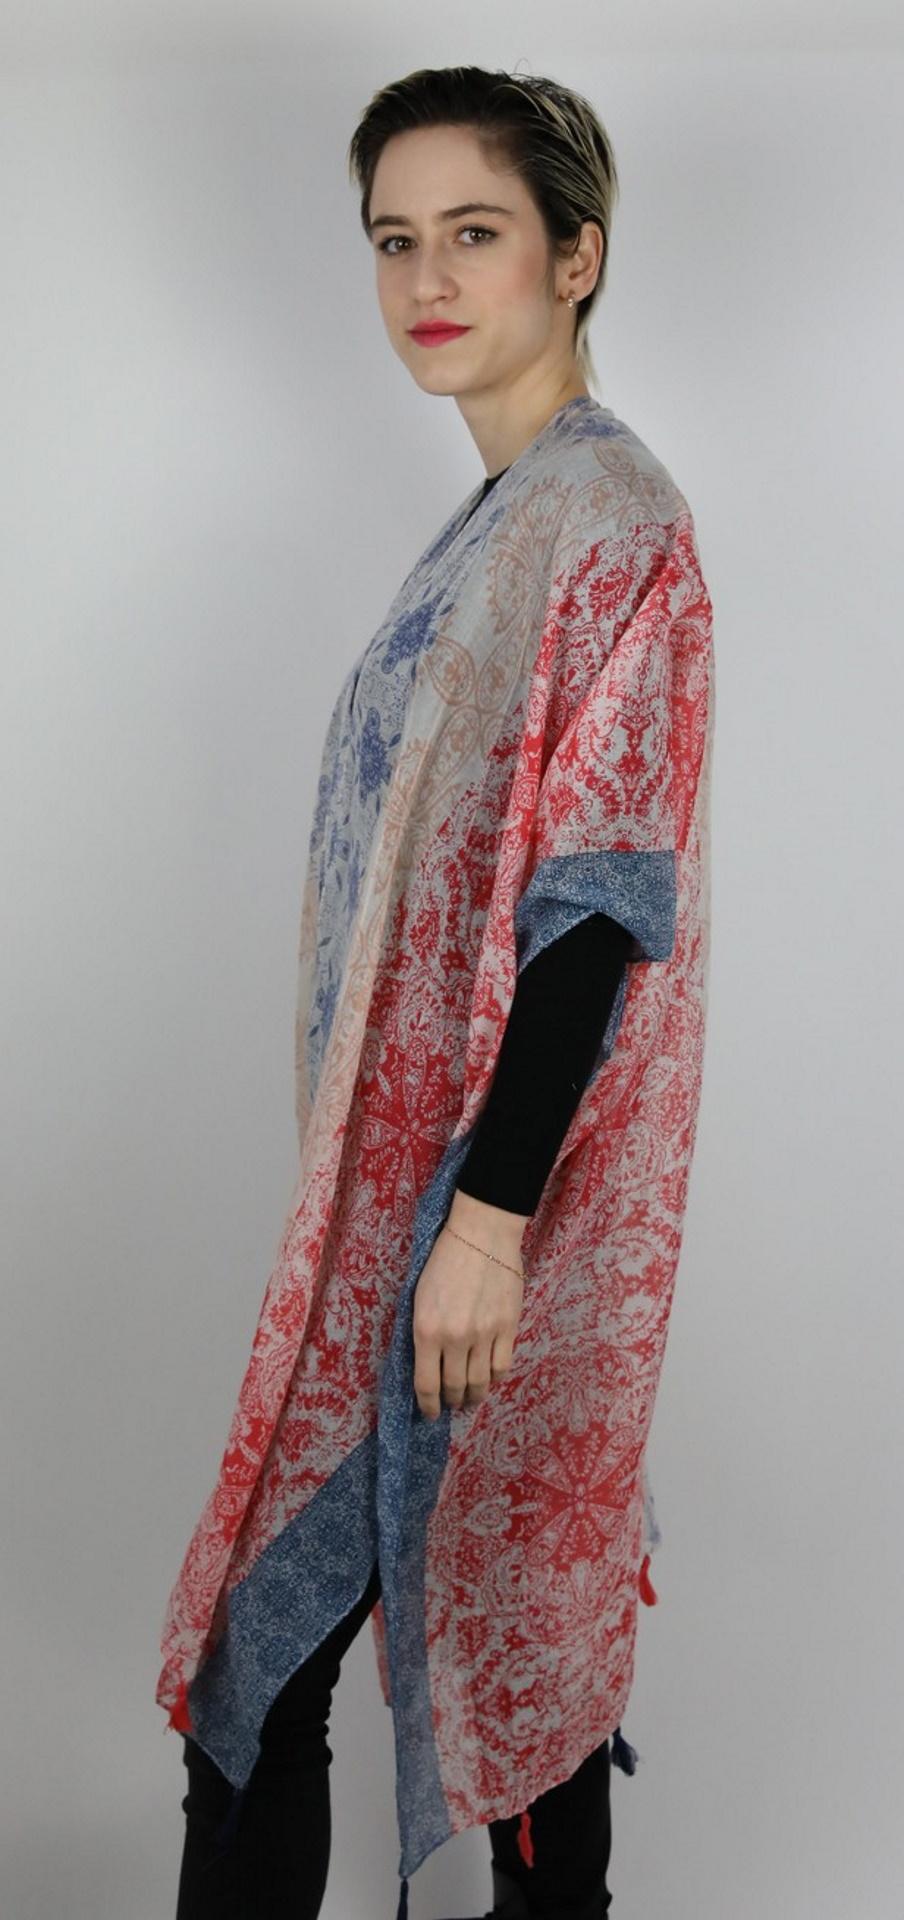 CLOTHES14 STOLA DONNA FOULARD CARDIGAN COPRISPALLE 2 1stAmerican elegante stola da donna foulard cardigan coprispalle